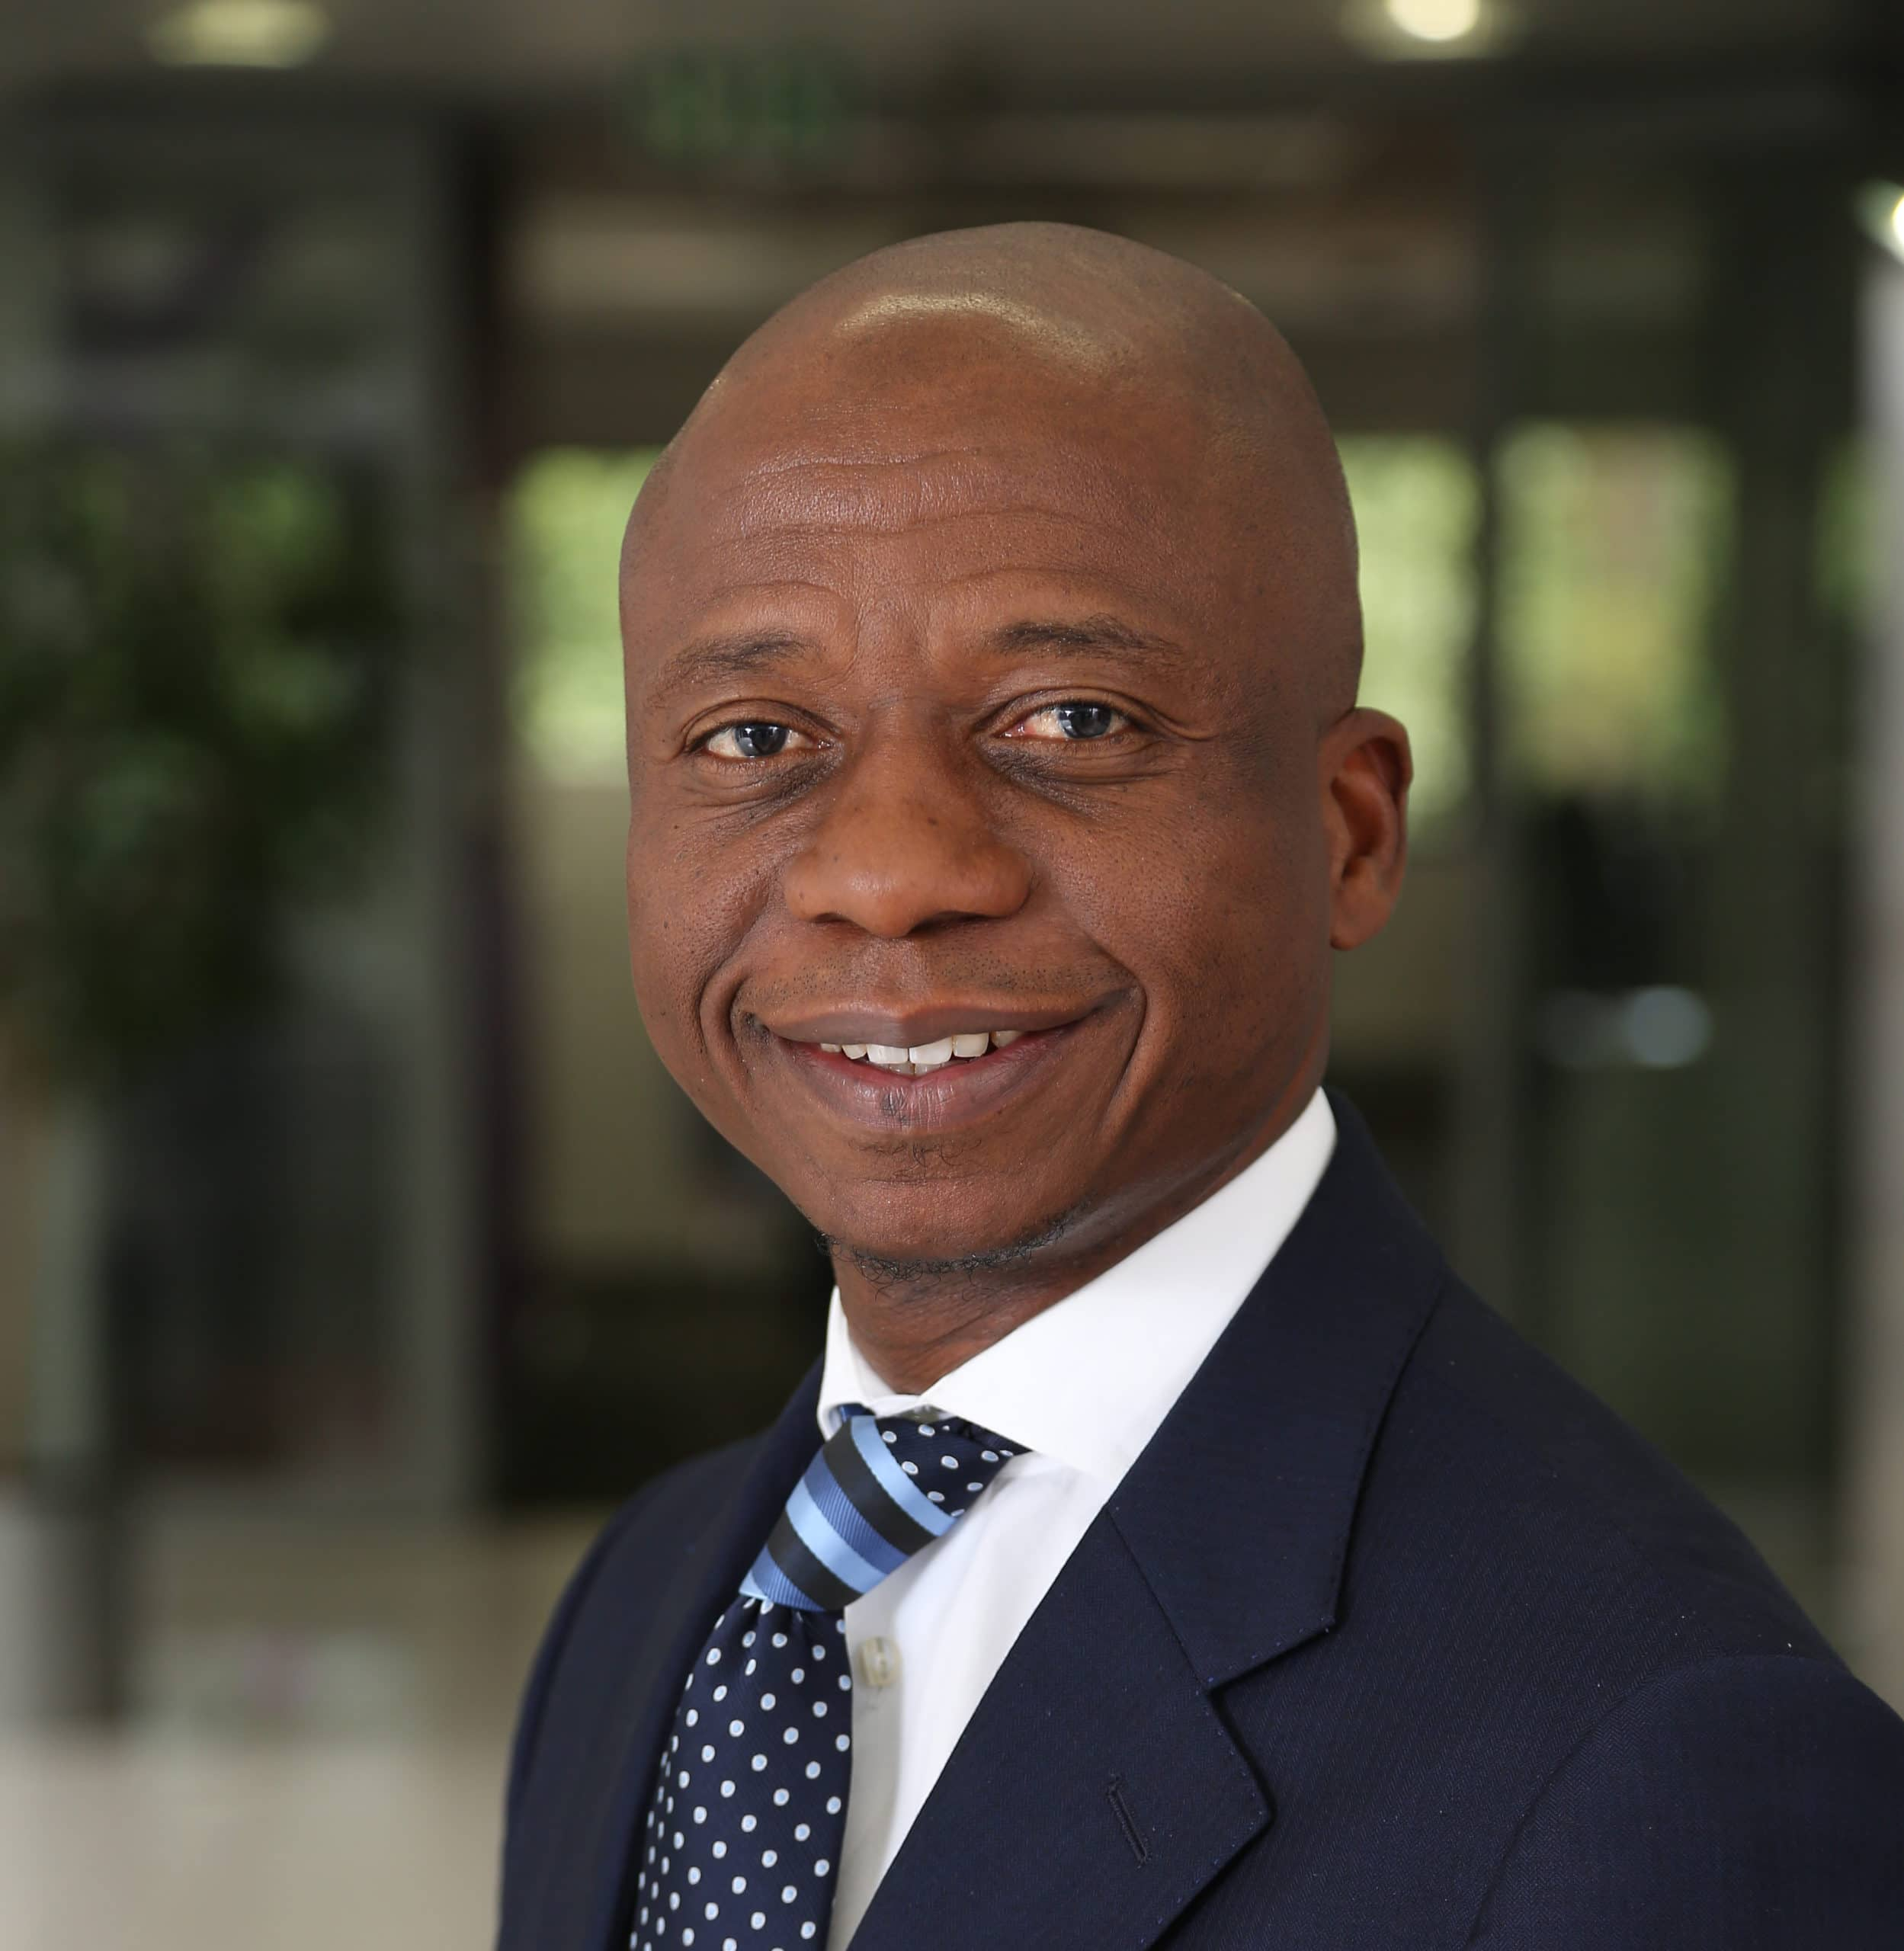 William Mzimba Vodacomex